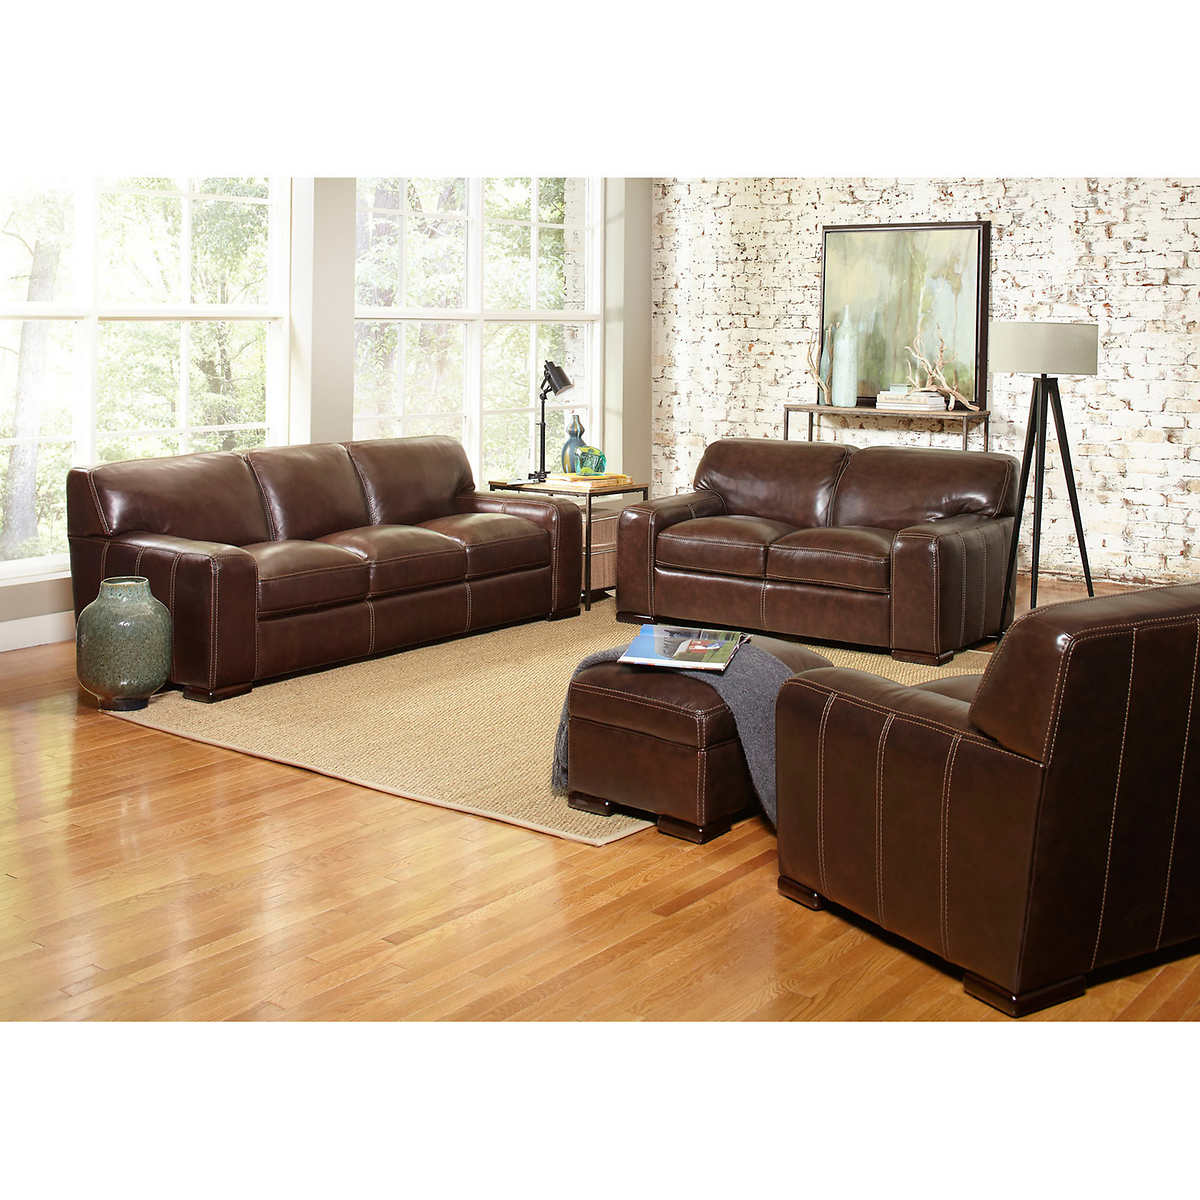 leather living room sets costco carreyton 4 piece top grain leather living room set